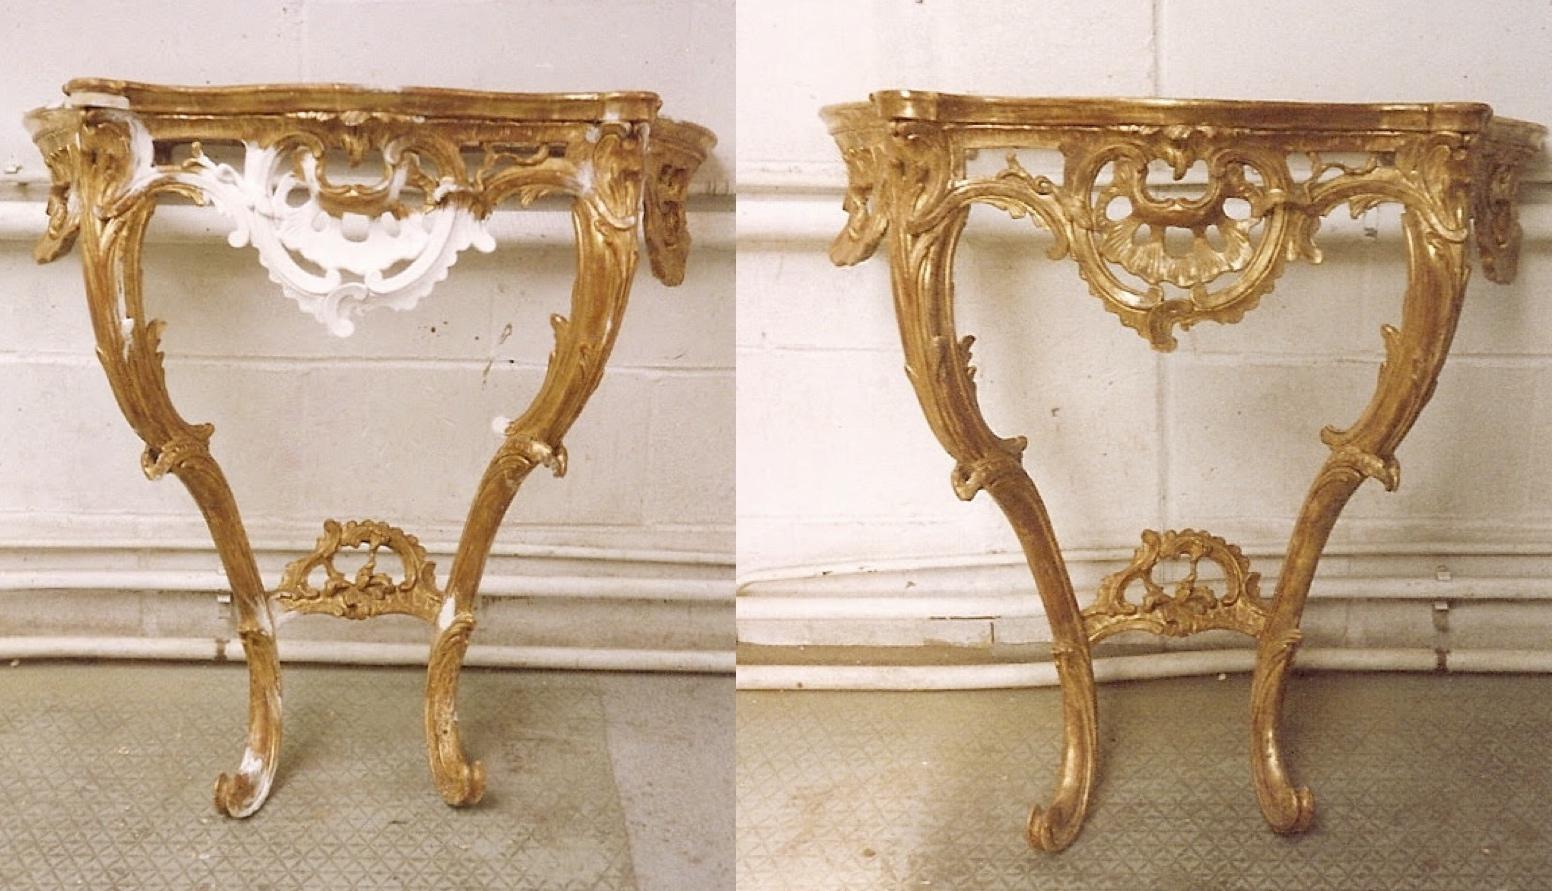 consol table restoration